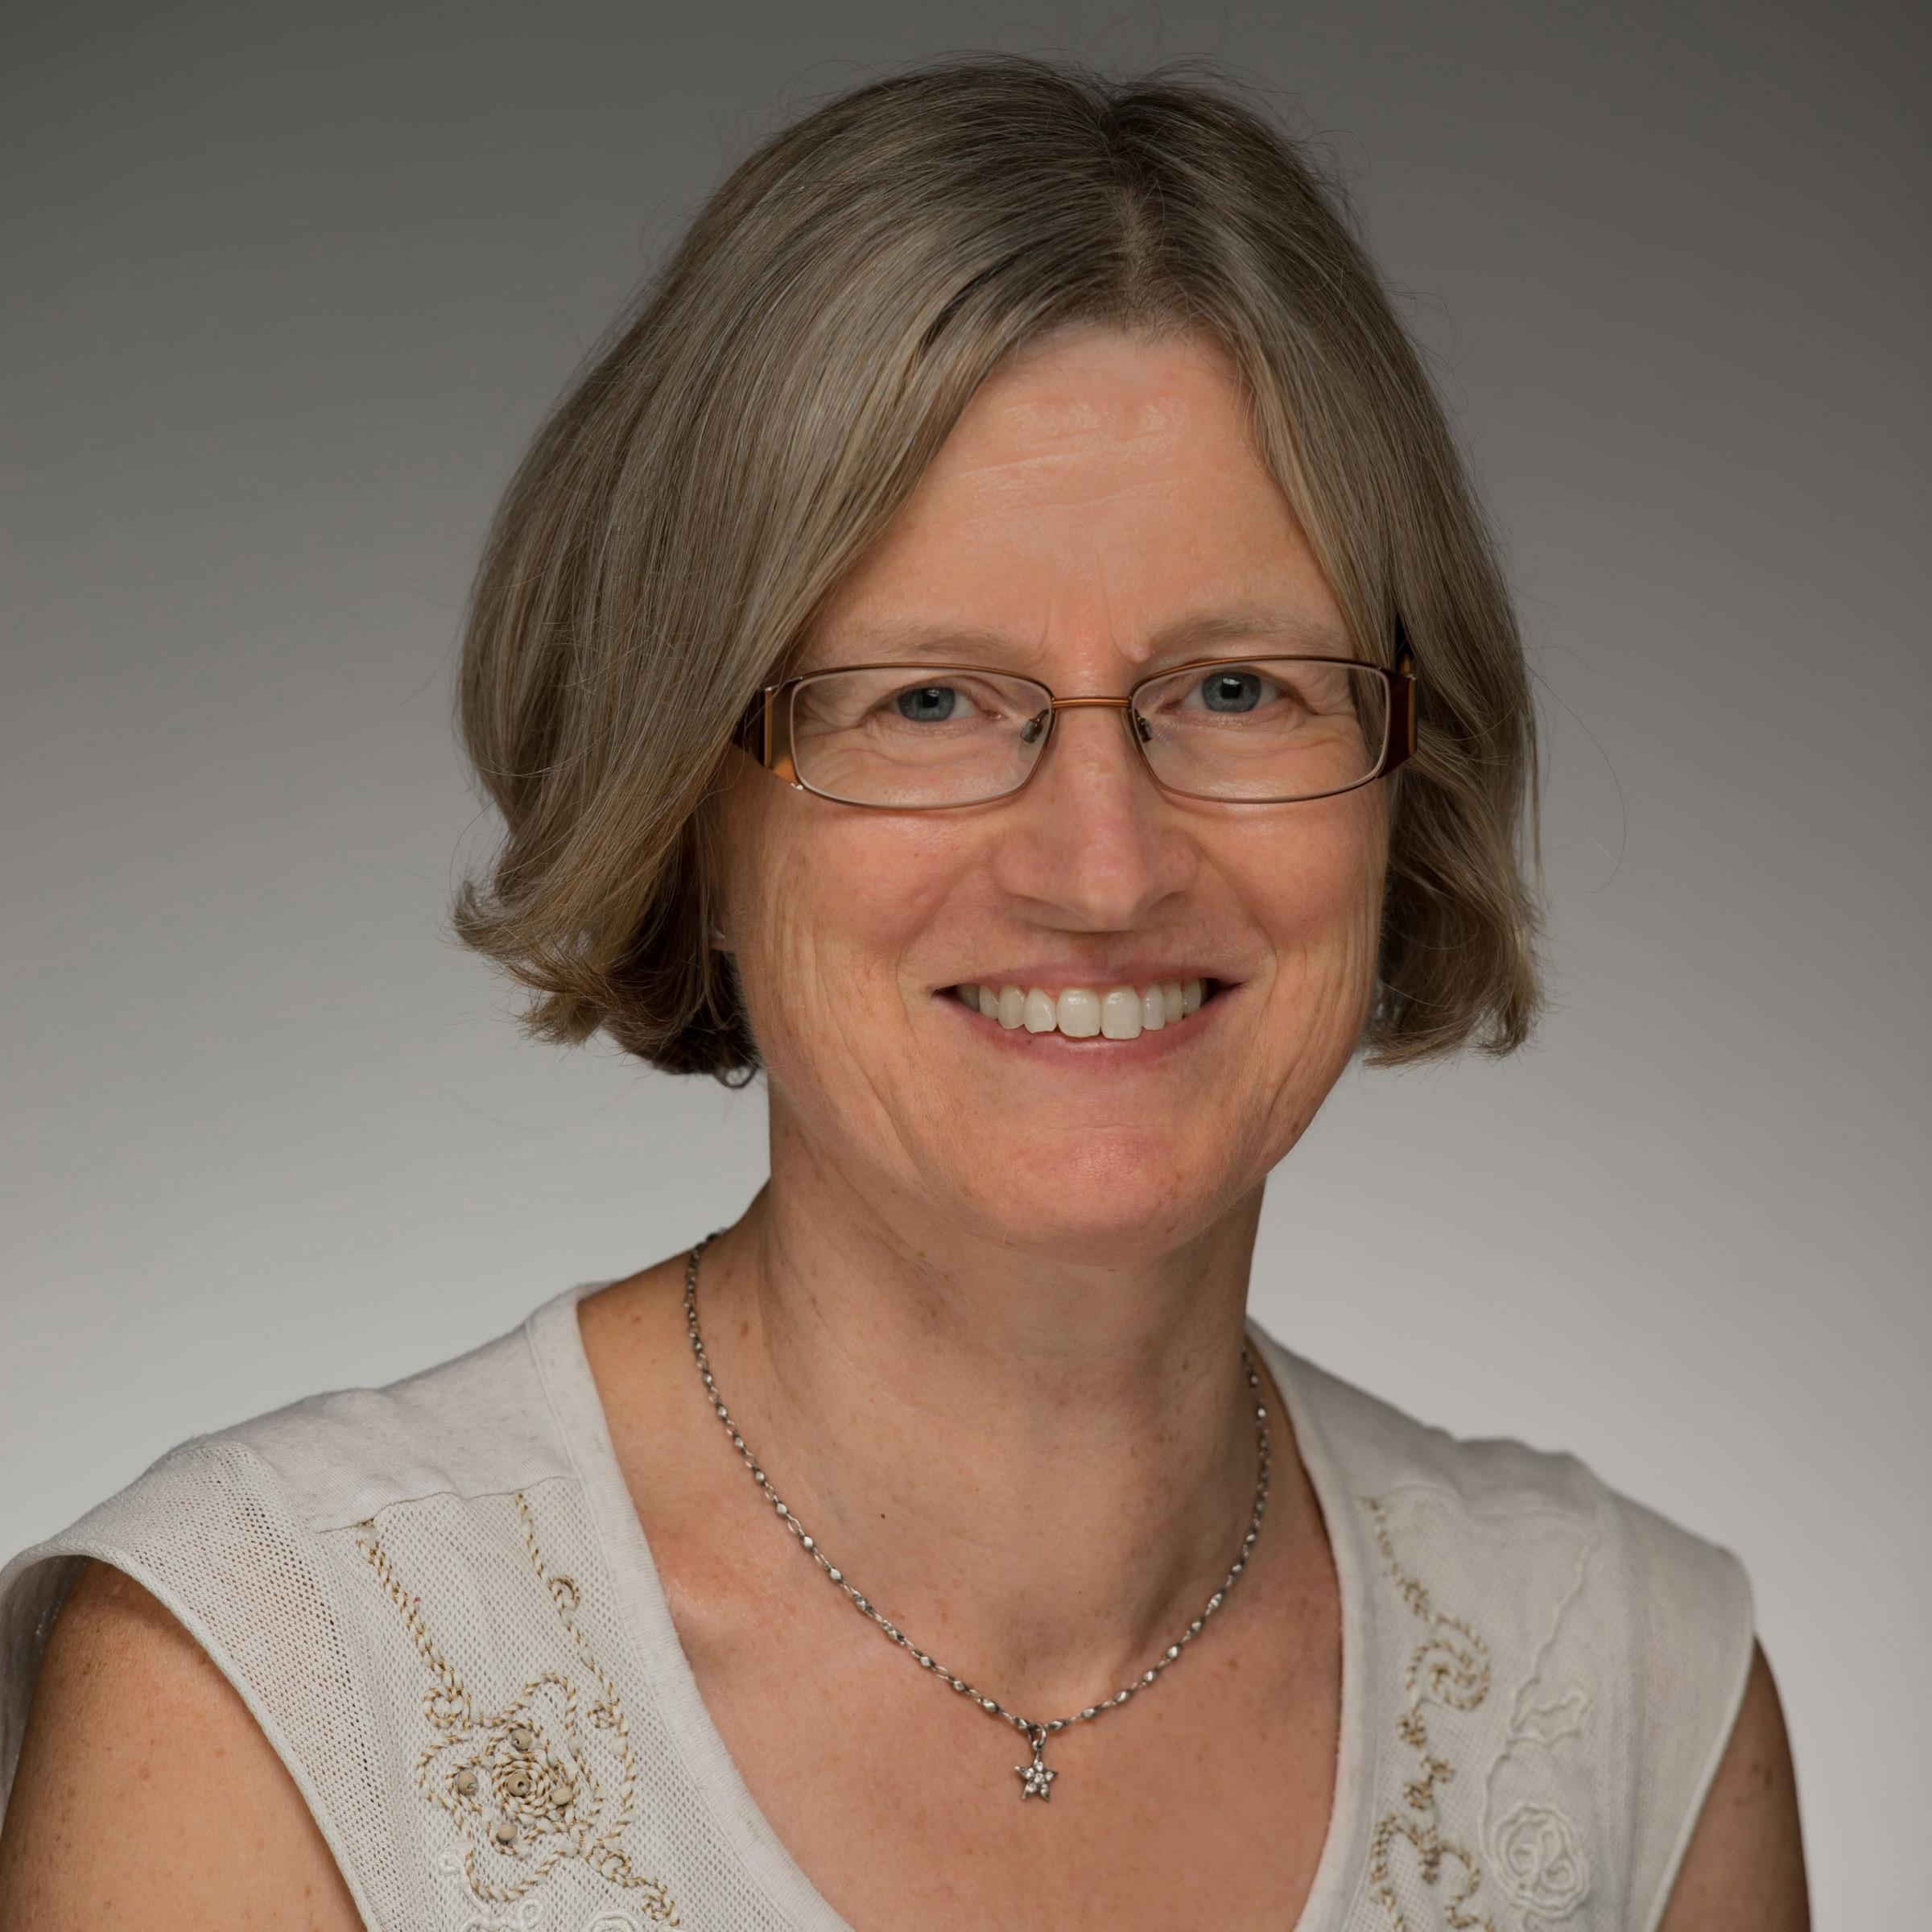 Prof Celia Deane-Drummond - Professor of Theology, University of Notre Dame